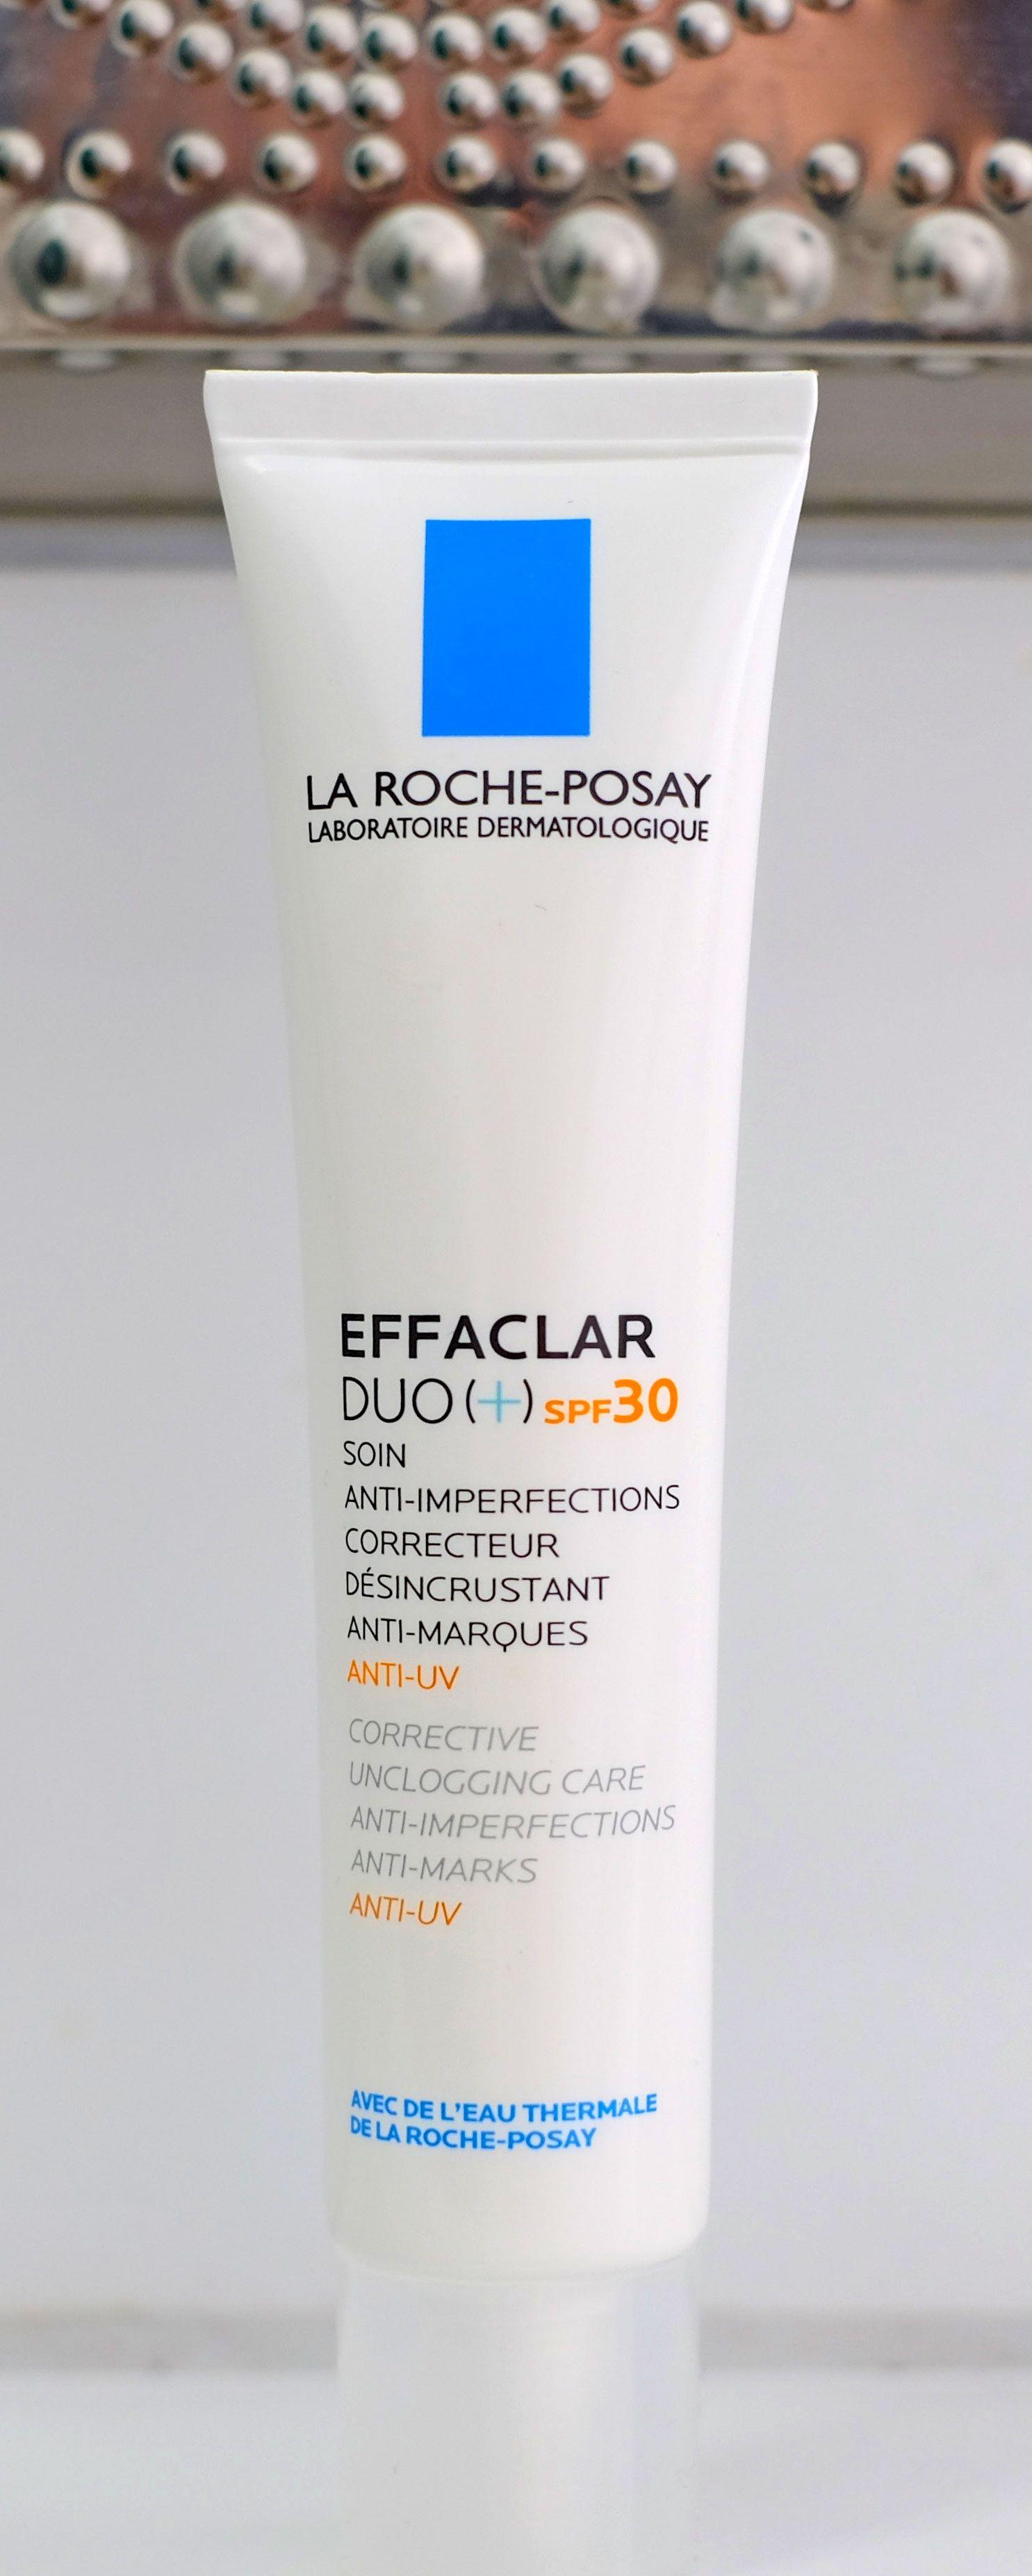 La Roche Posay Effaclar Duo Spf 30 In 2020 Hormonsystem Roche Posay Apotheke